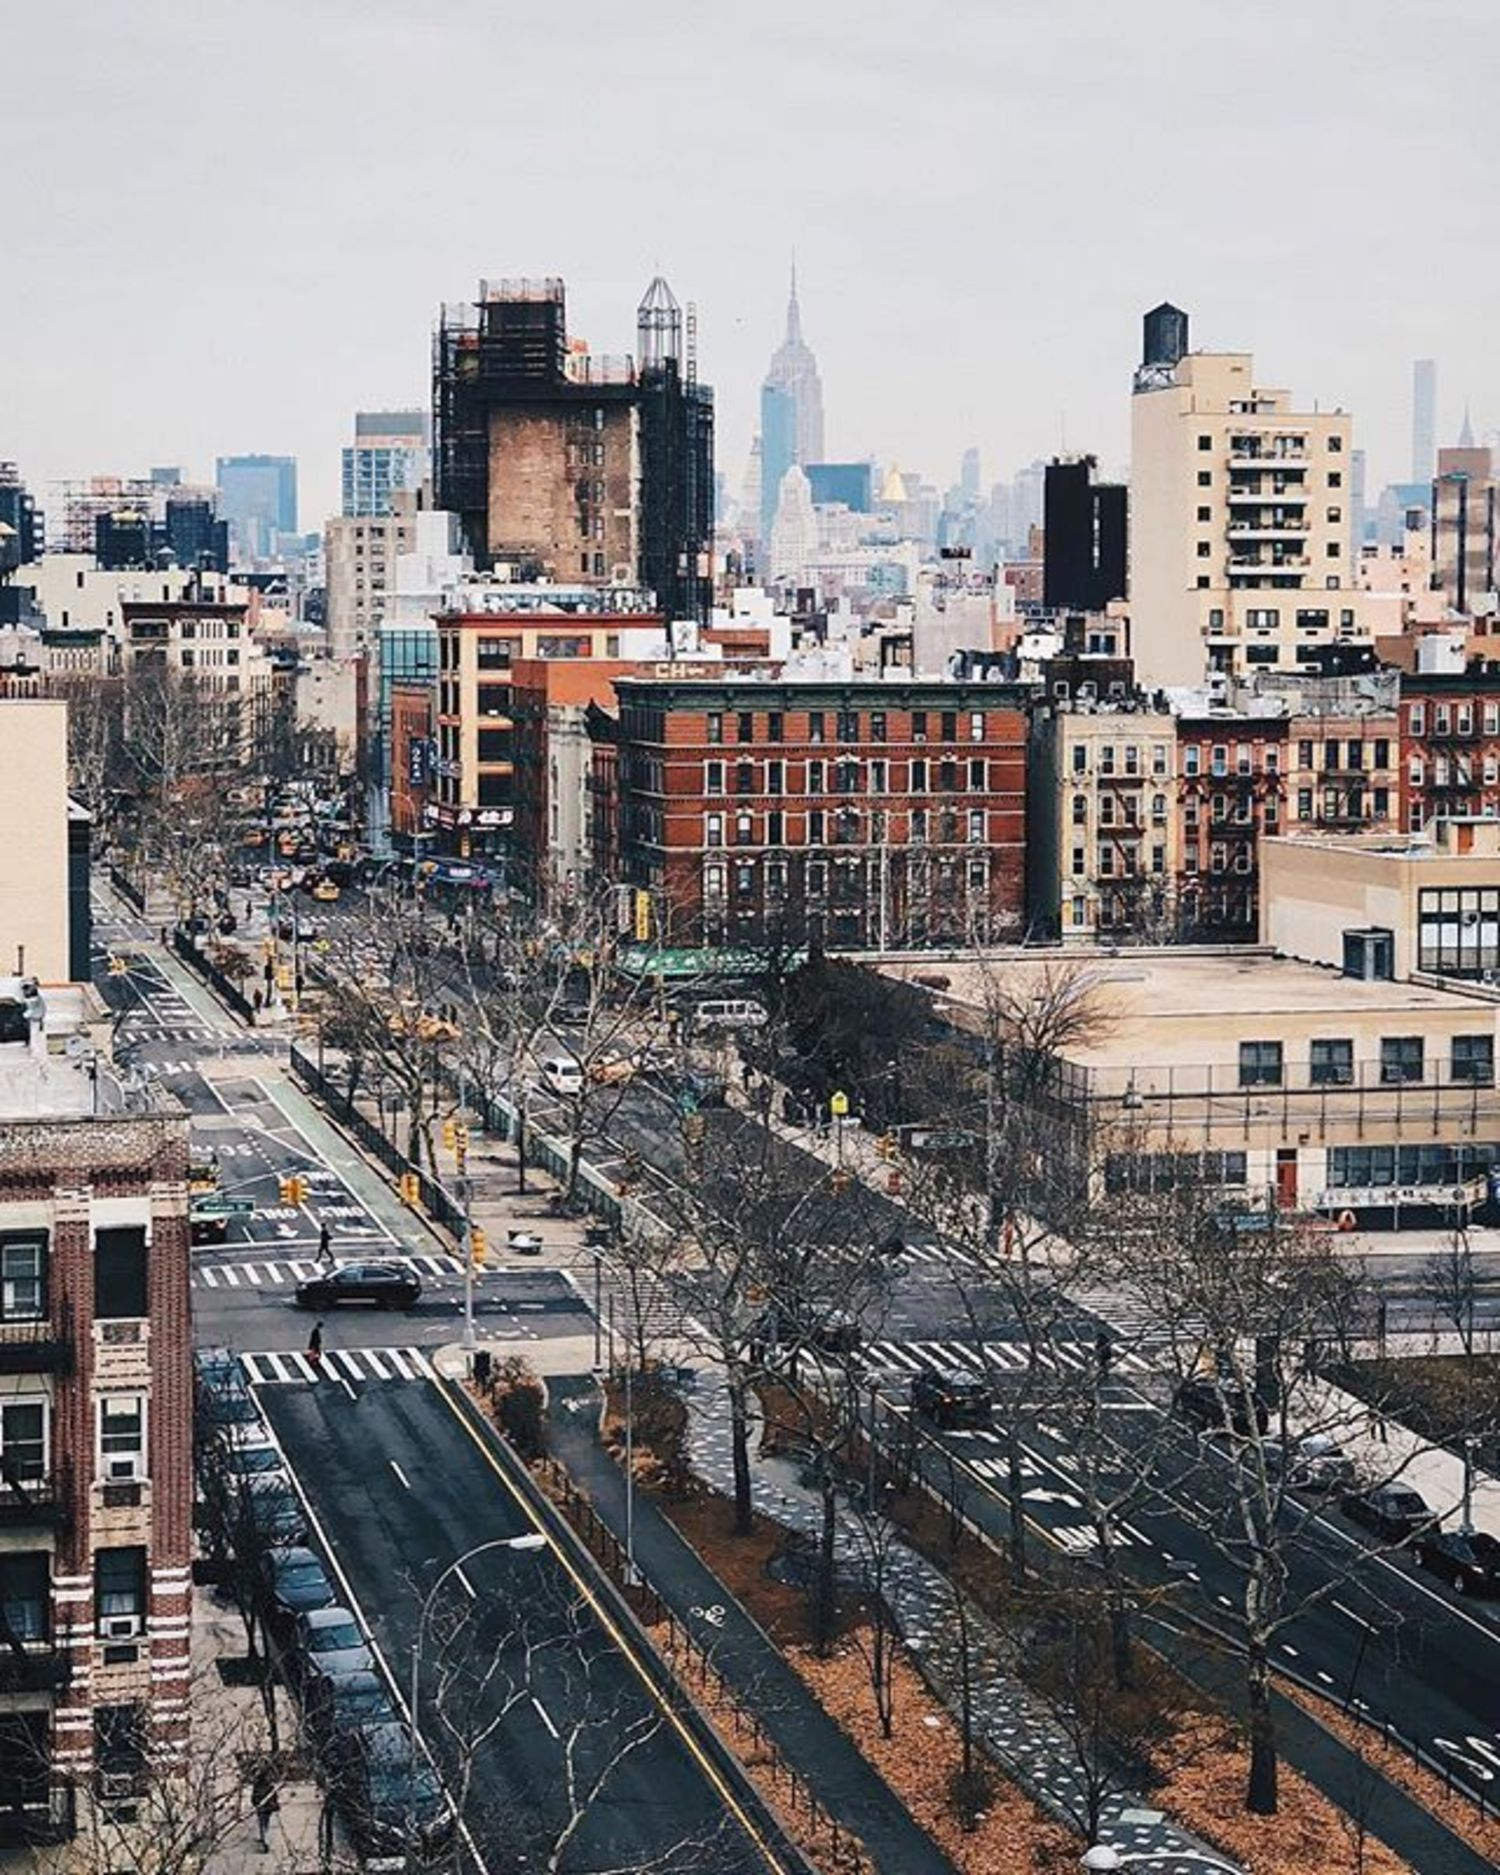 Lower East Side, New York, New York. Photo via @melliekr #viewingnyc #newyork #newyorkcity #nyc